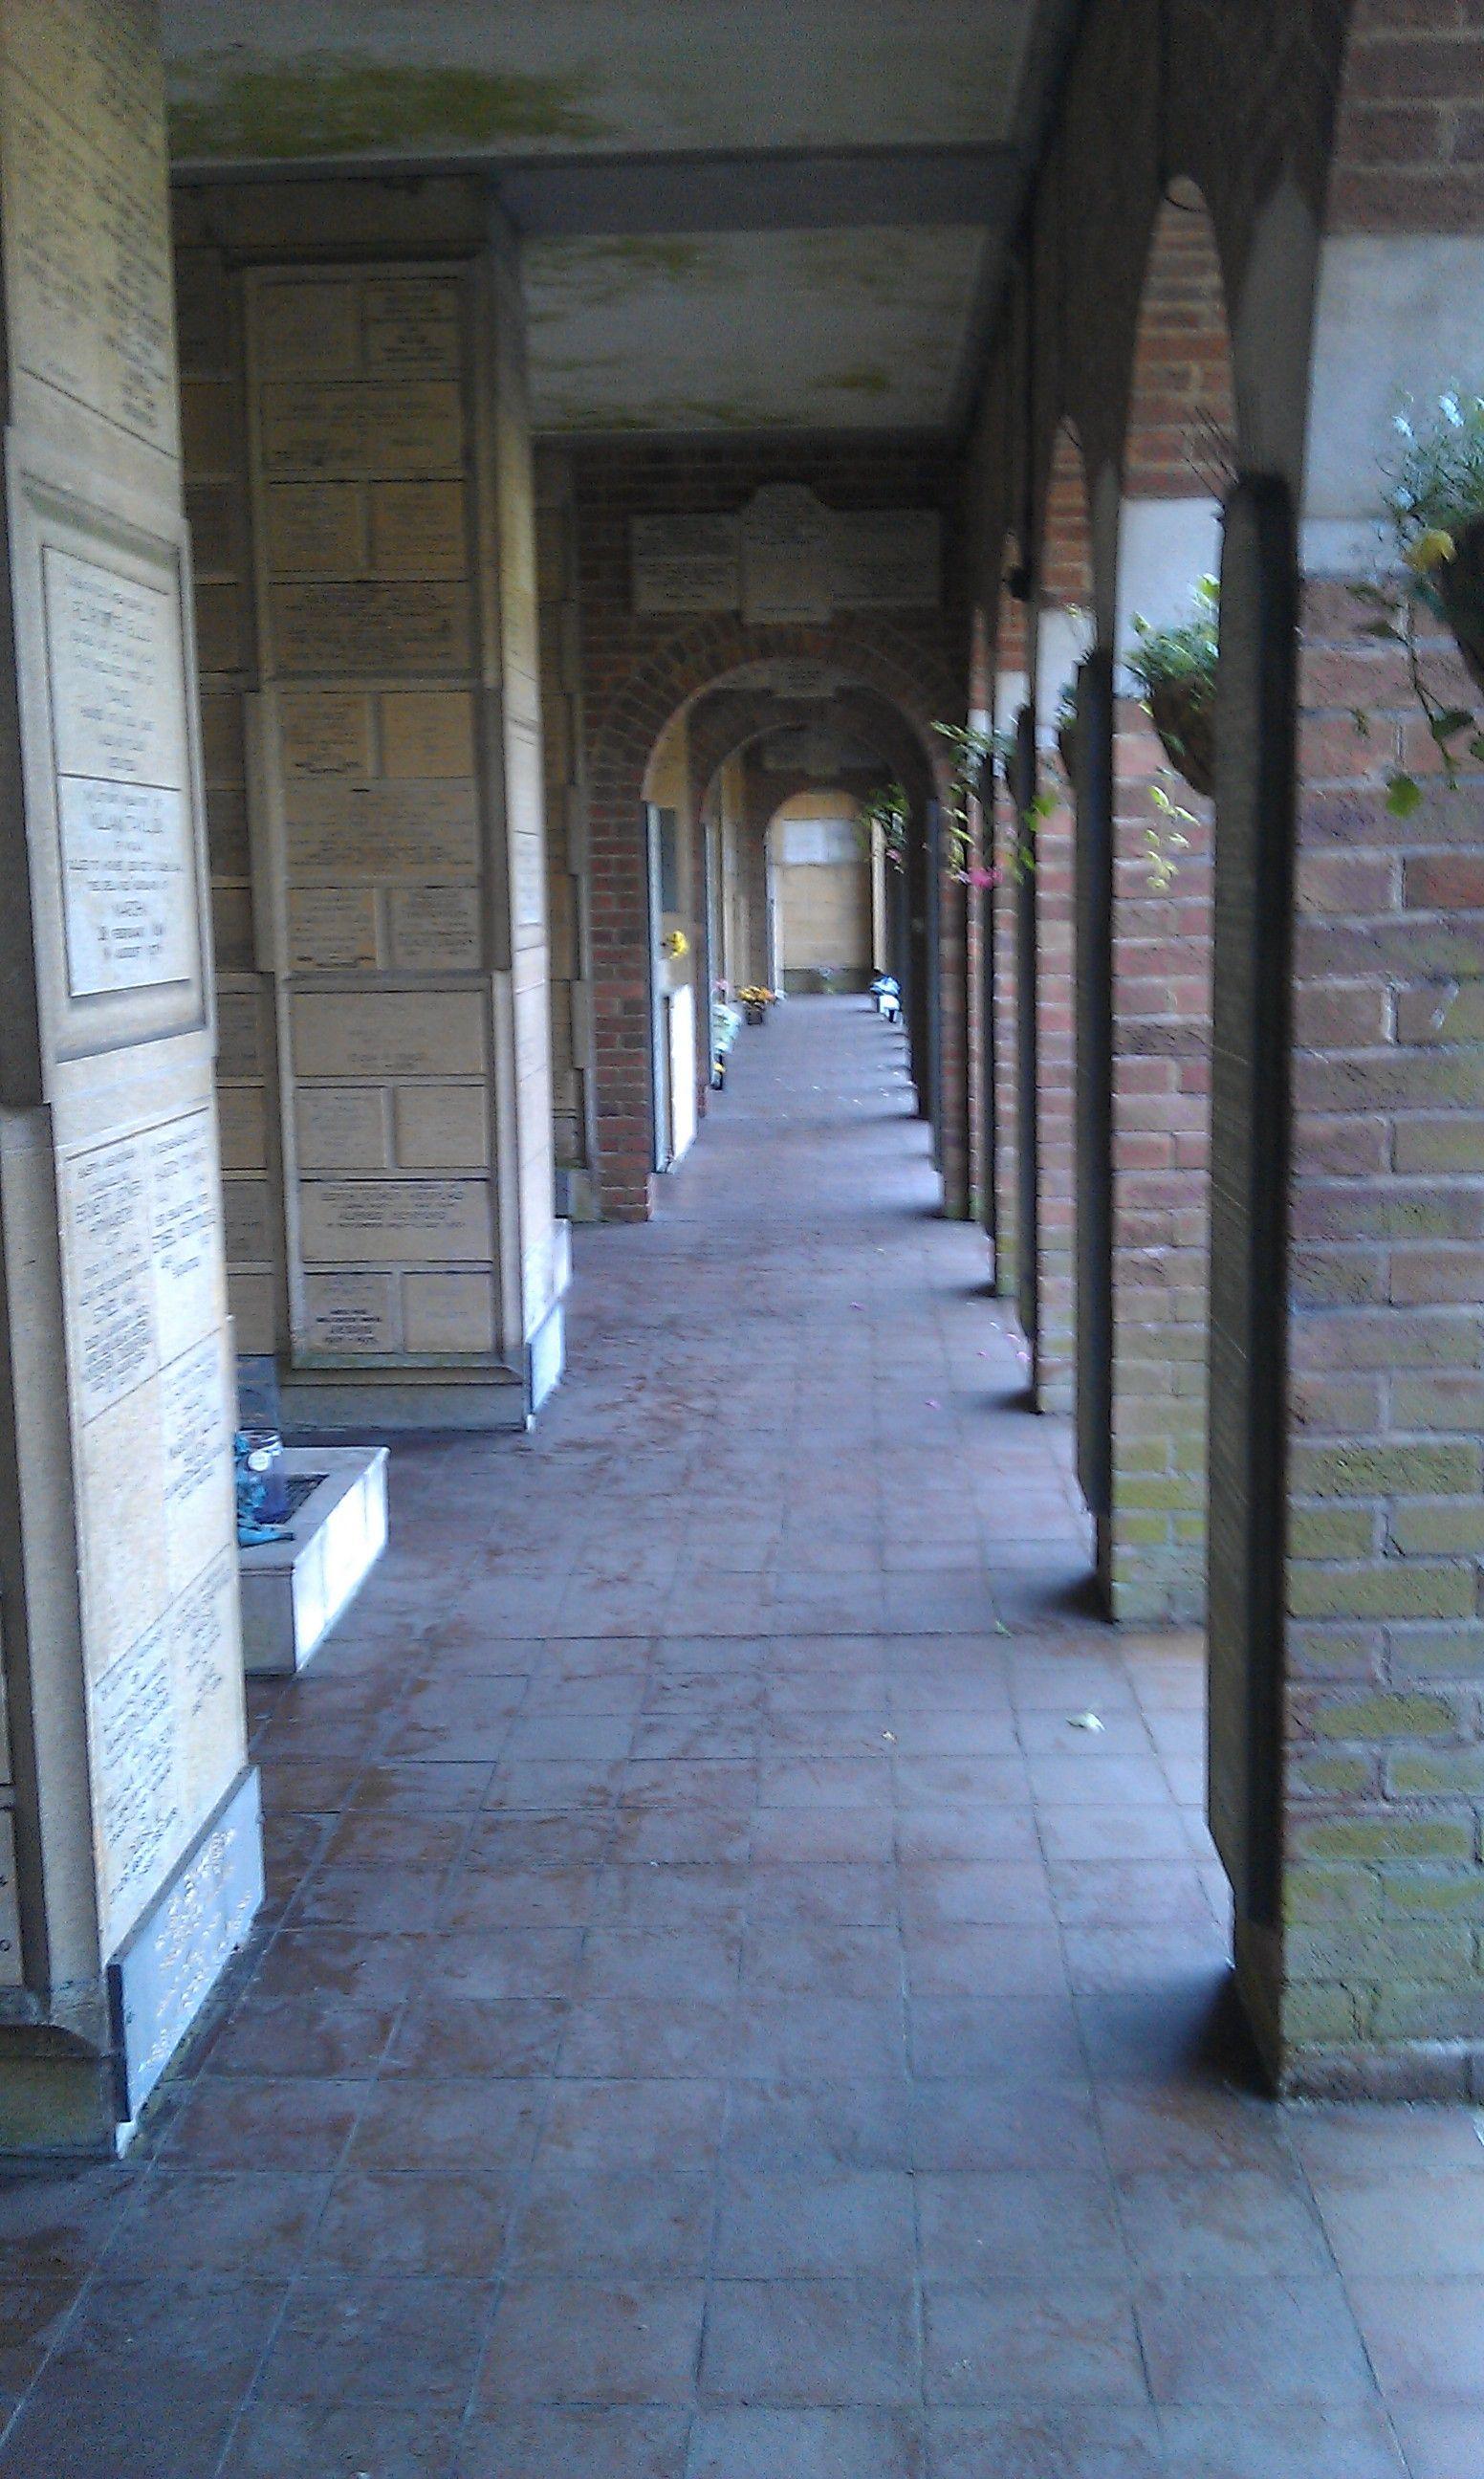 The Old Memorial Wall, Manchester Crematorium